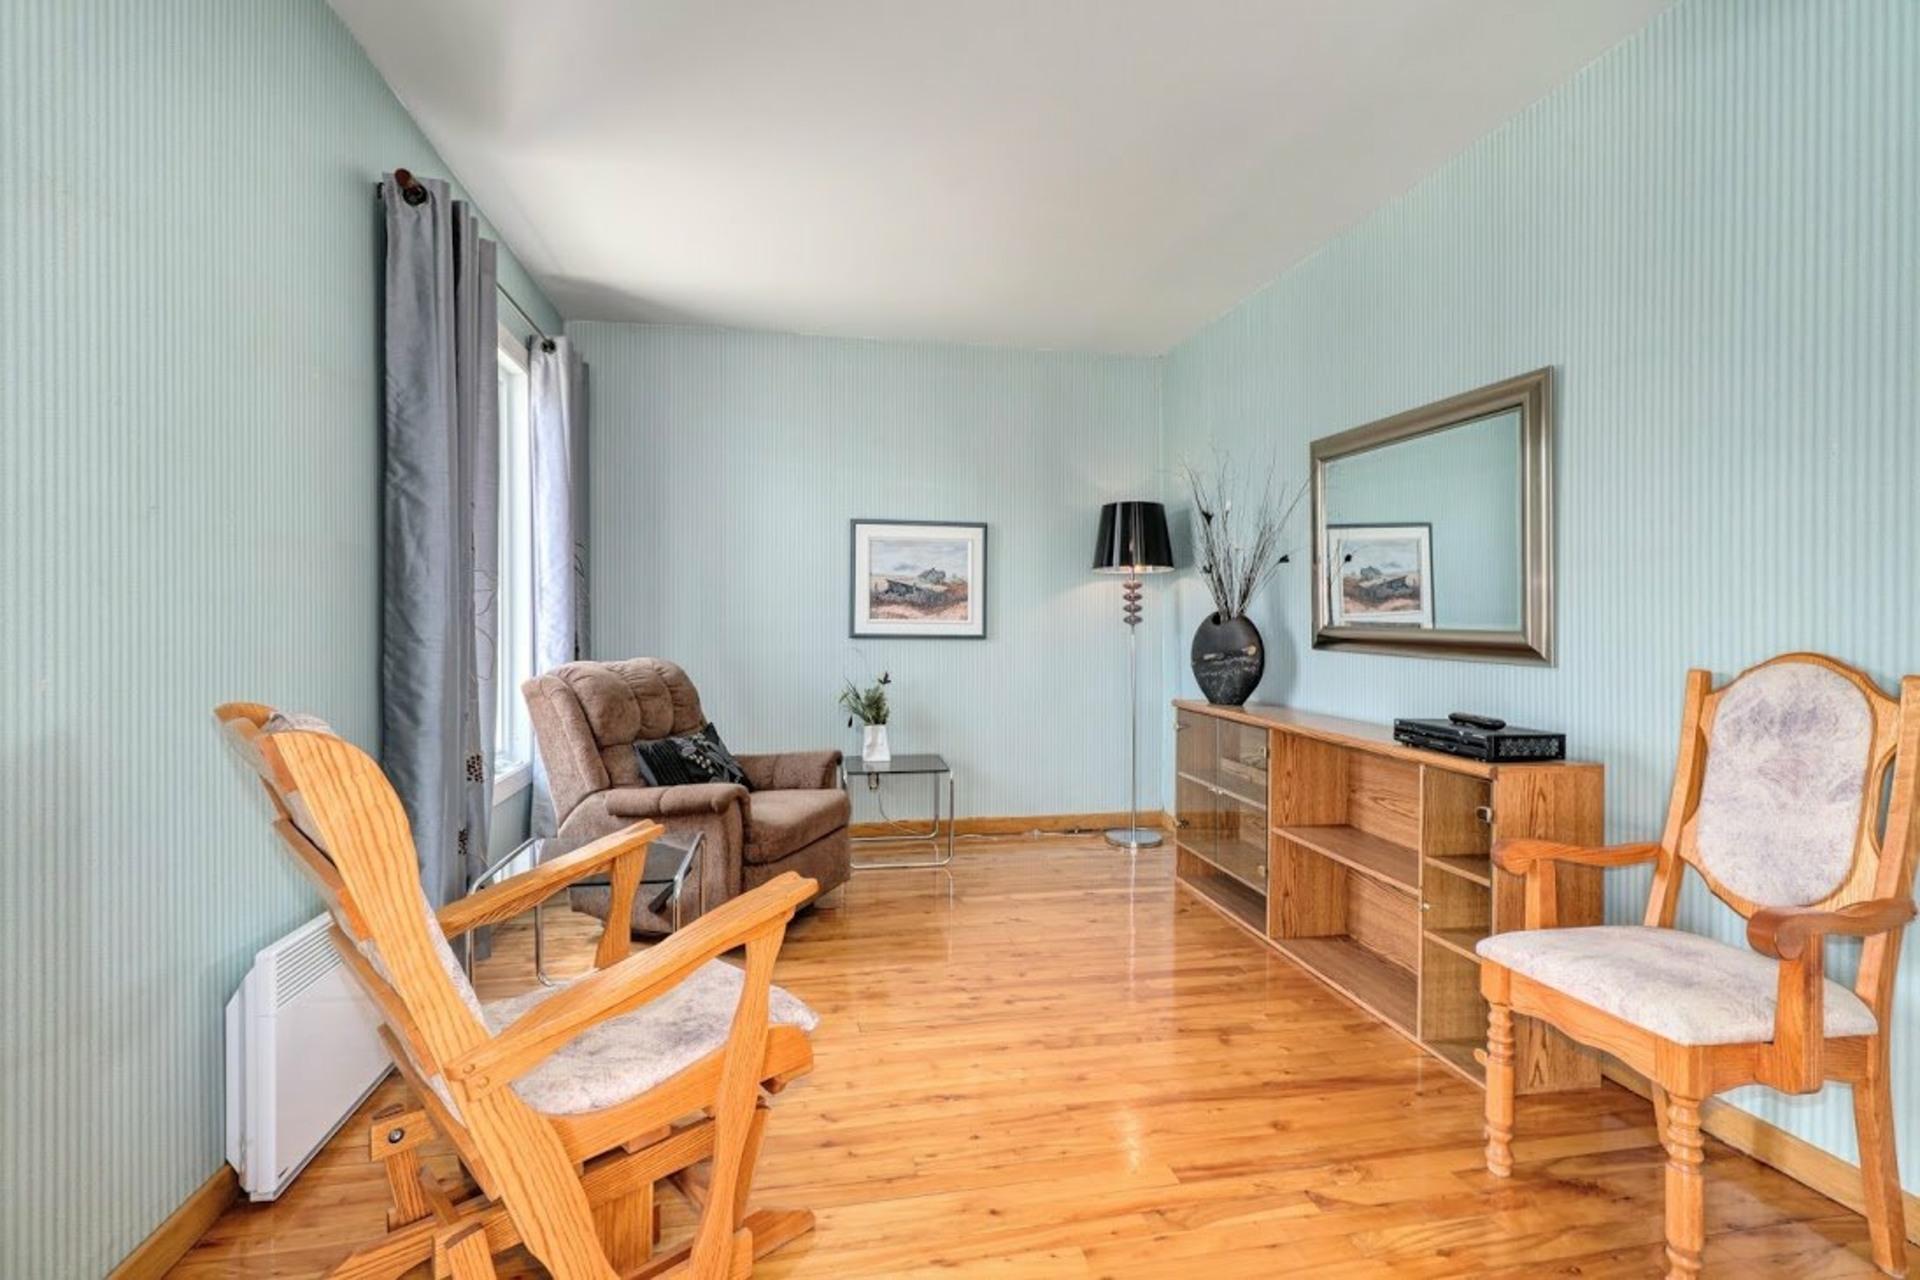 image 5 - House For sale Notre-Dame-des-Prairies - 9 rooms